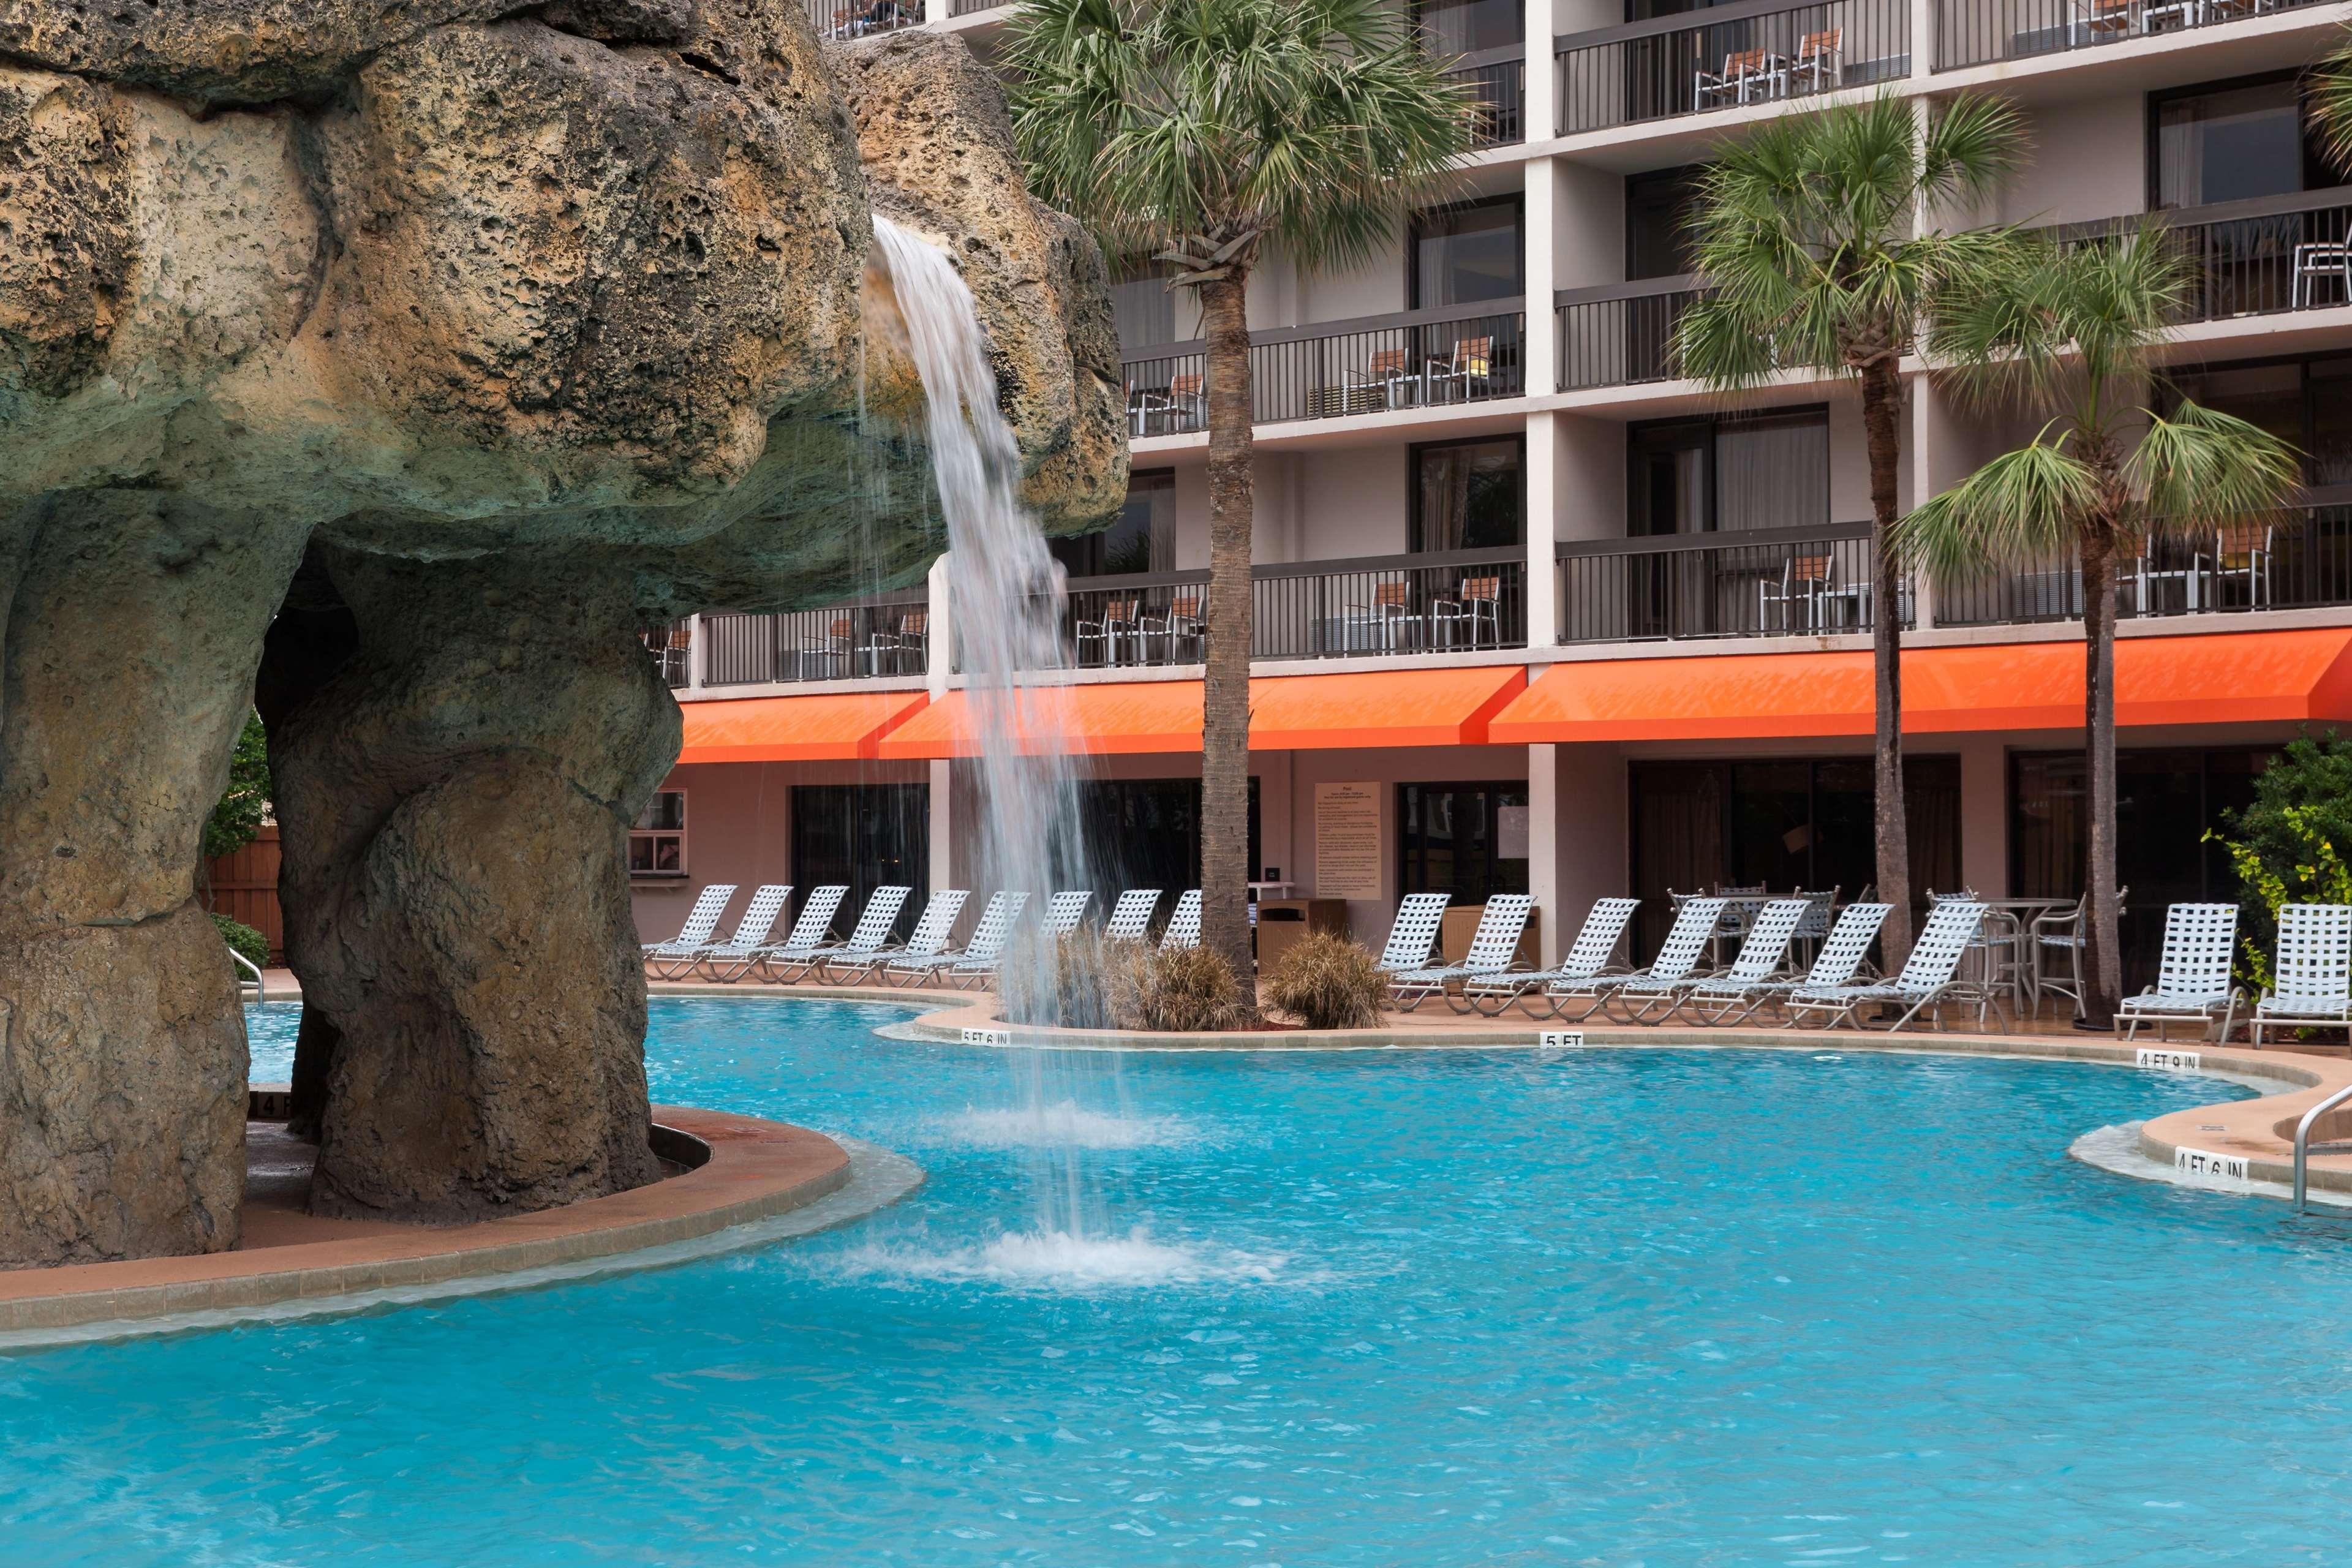 Seawalk Hotel Jacksonville Beach Fl